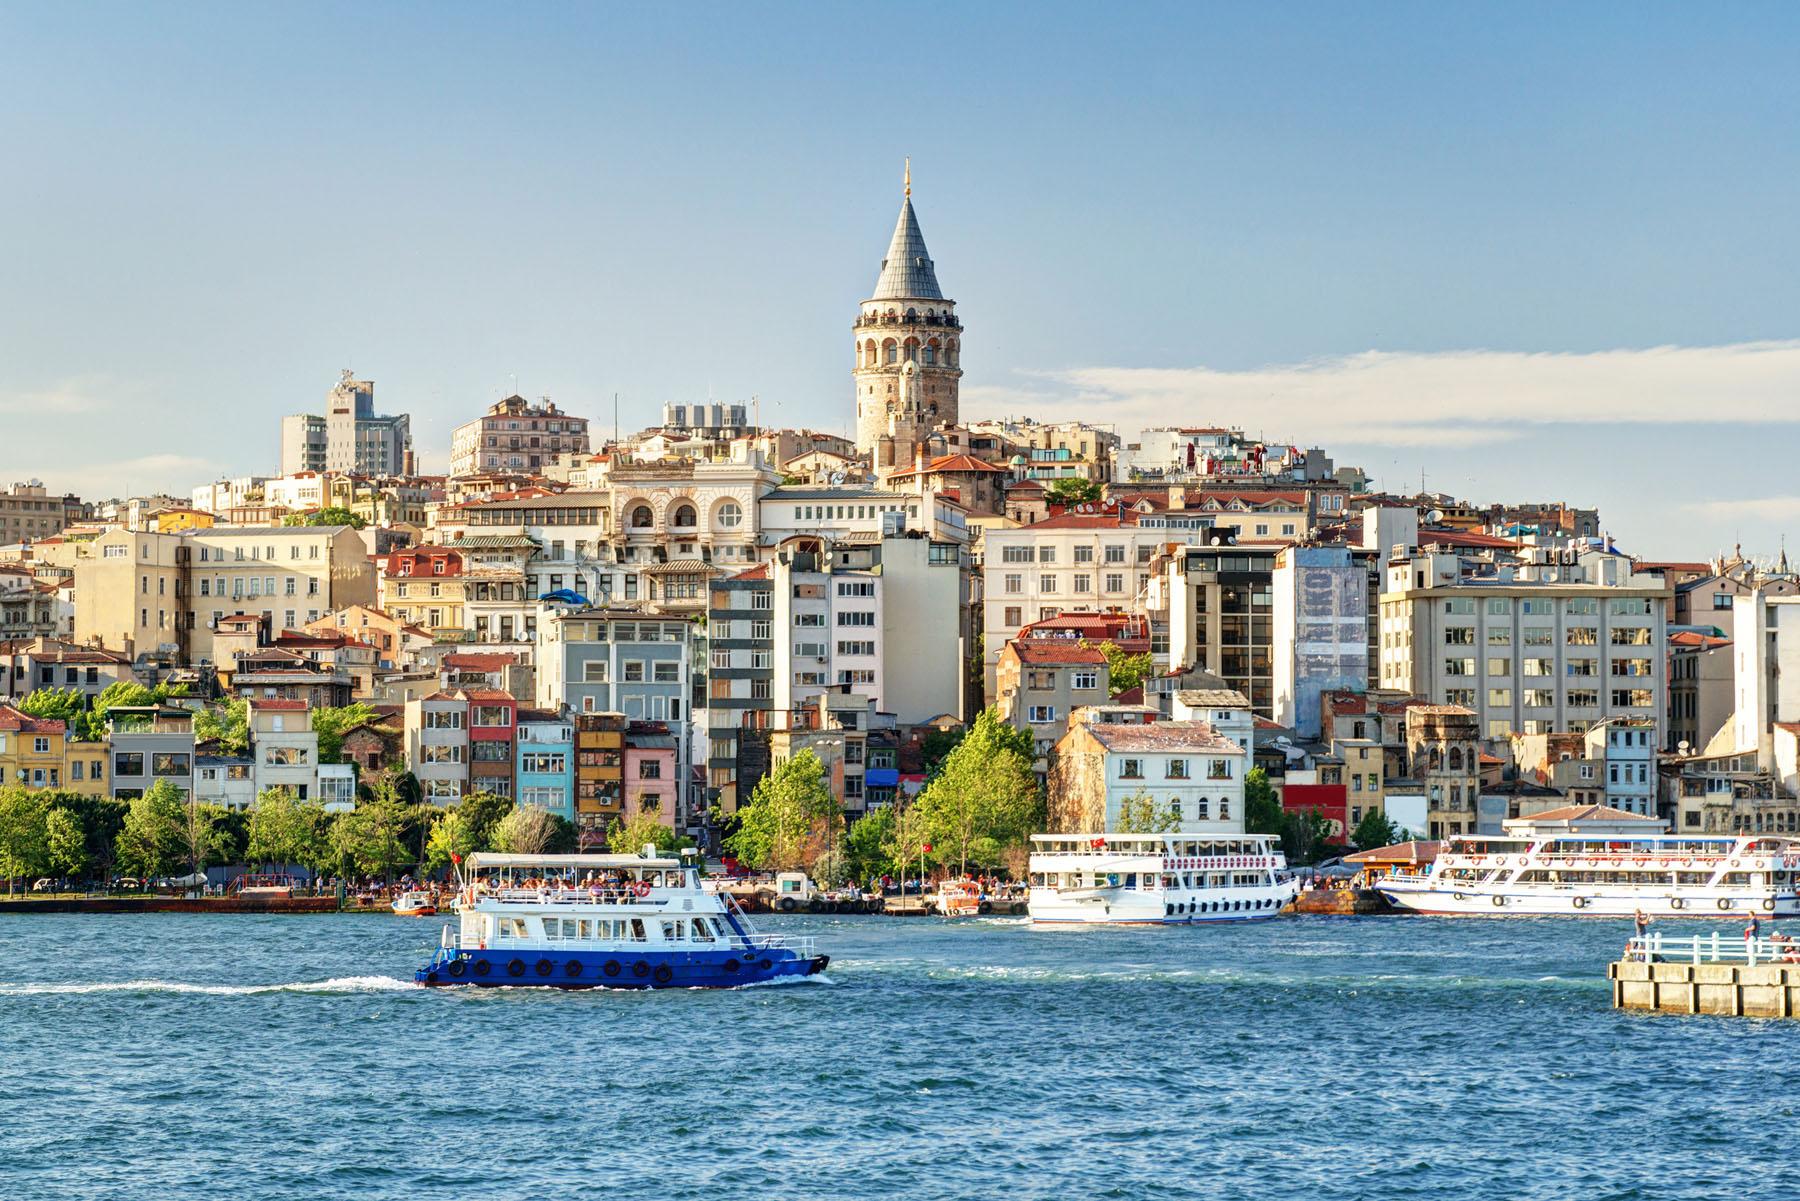 Turkey-Konstantinoupoli_142217722